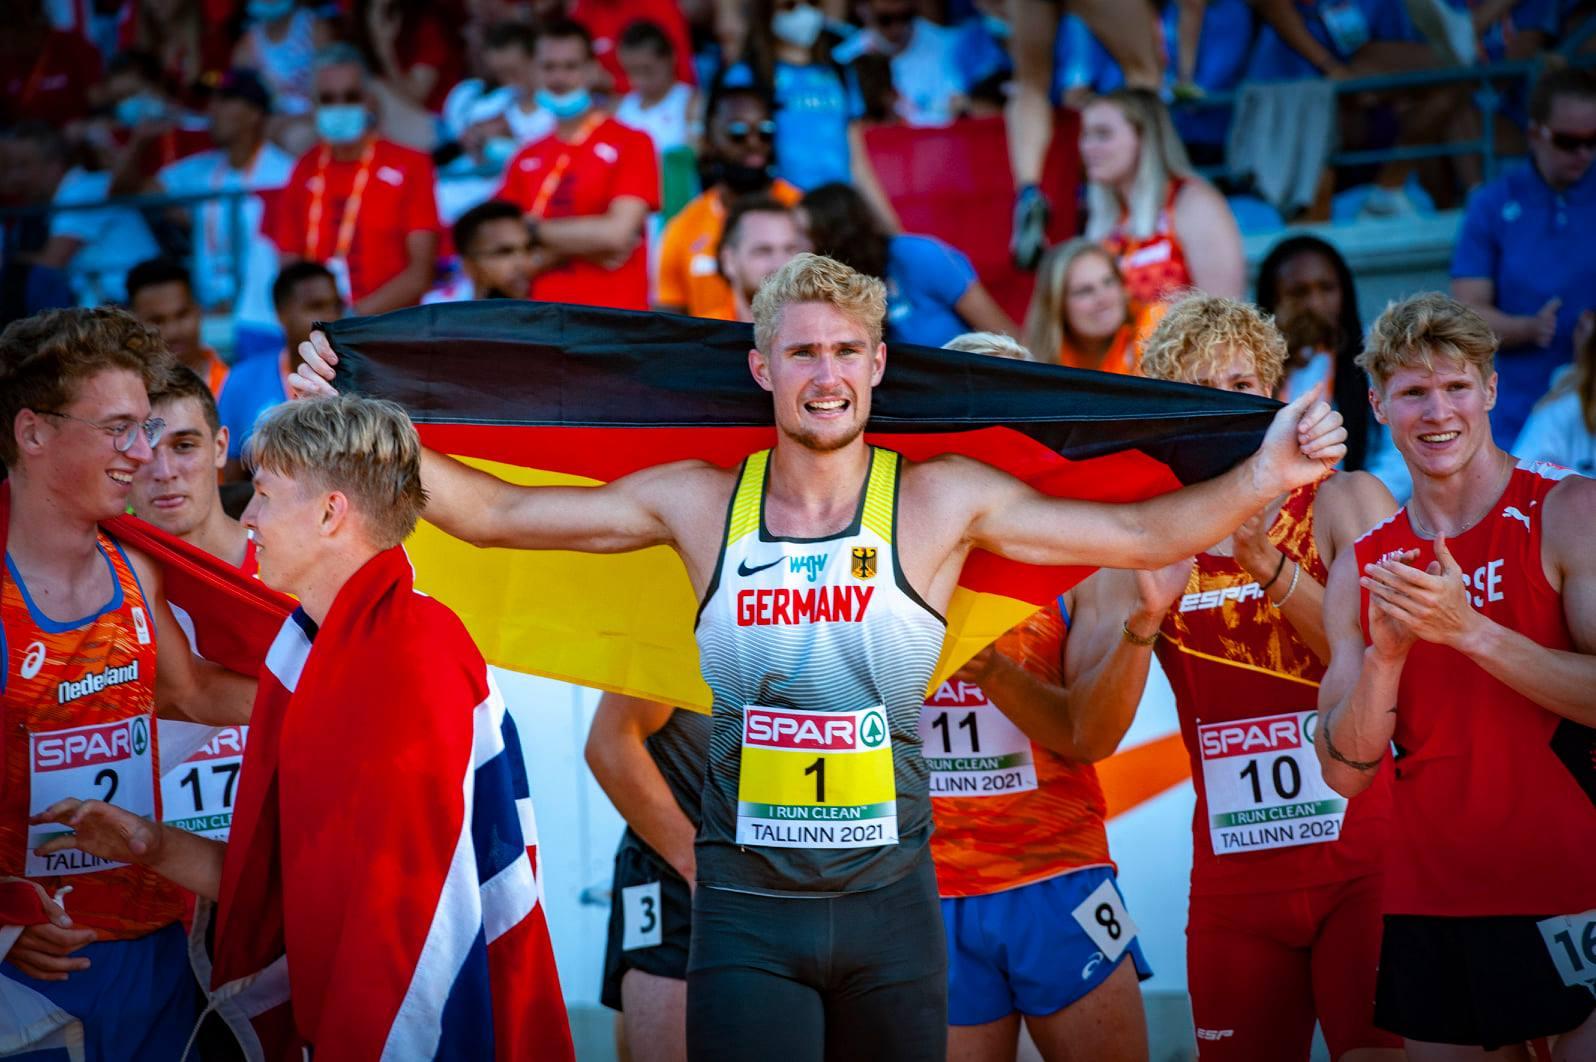 Review: 2021 European U23 Championships, Tallinn